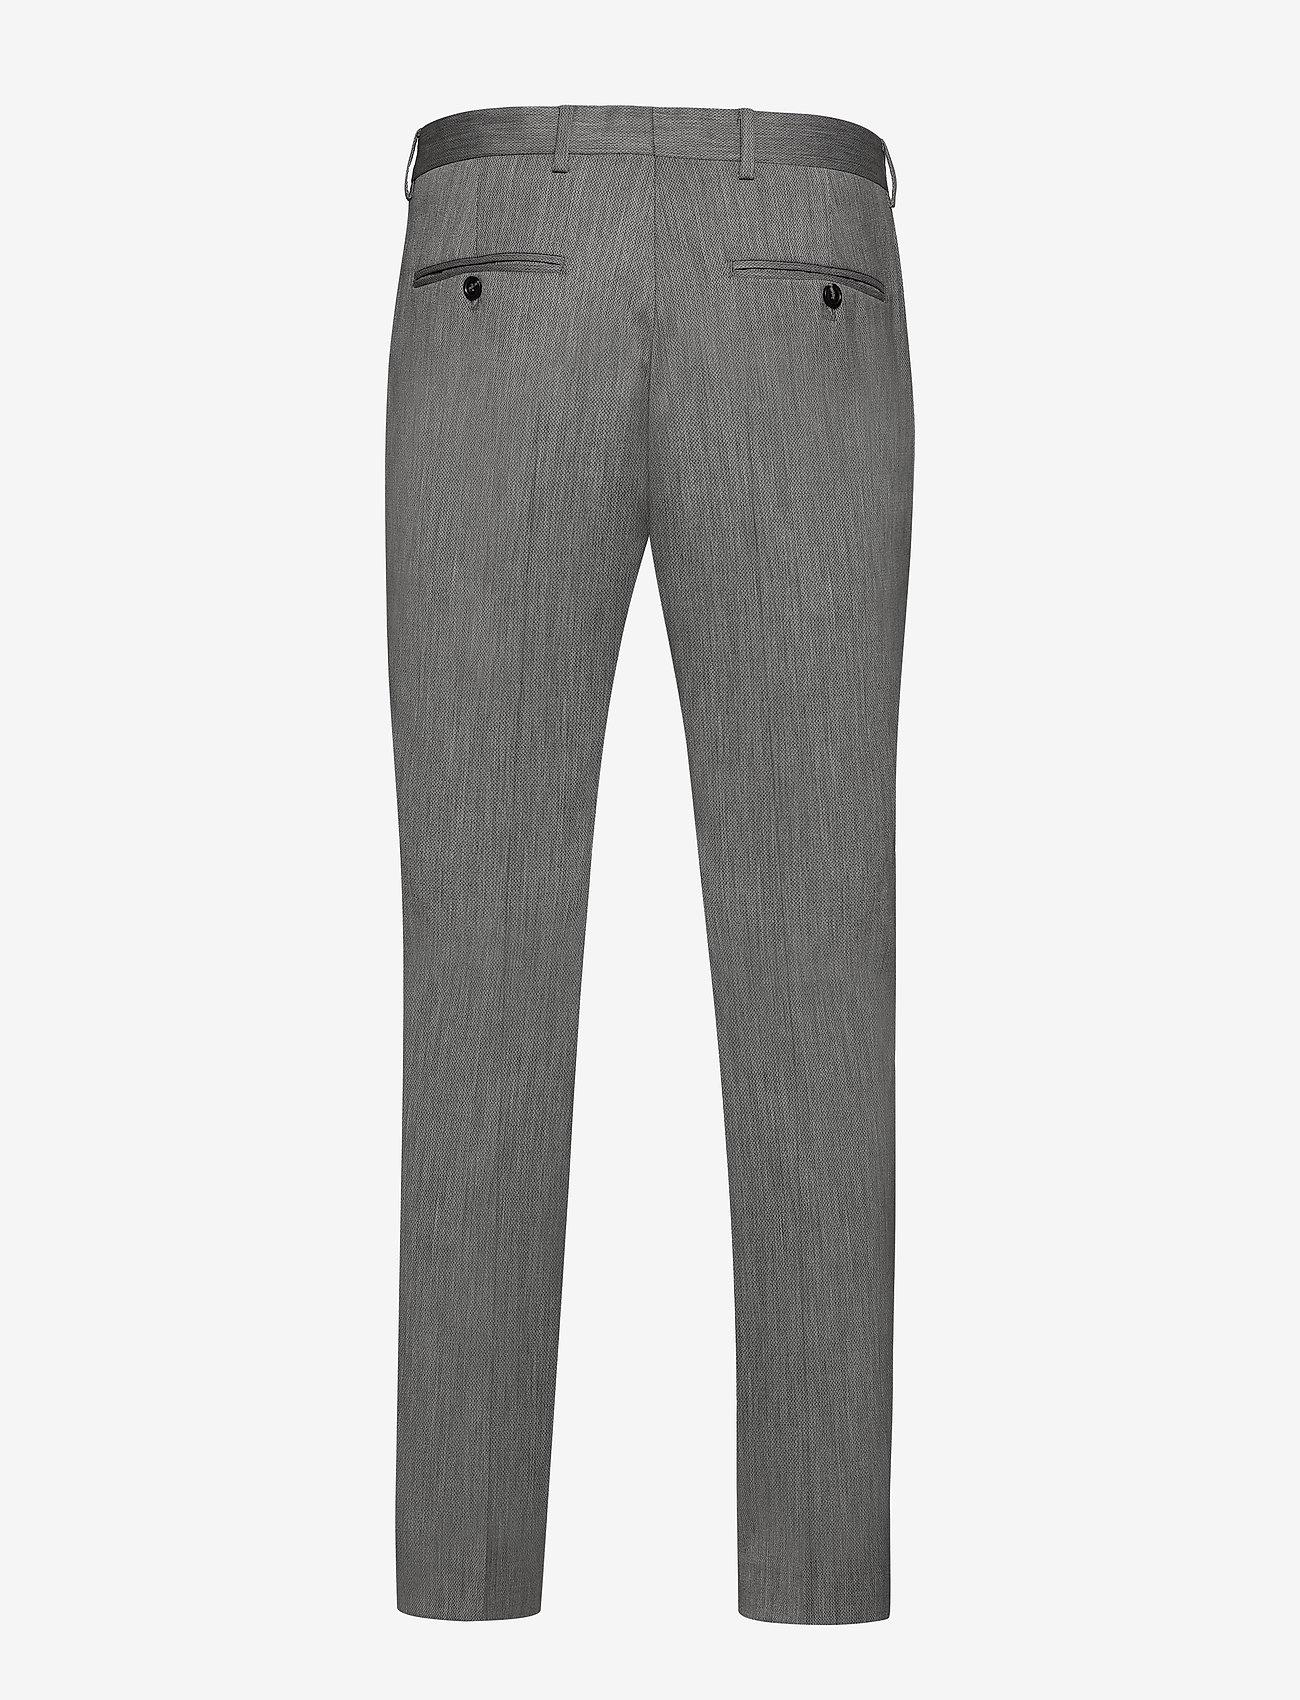 Selected Homme - SLHSLIM-MYLOBILL LT GREY STRC TRS B NOOS - suitbukser - light grey melange - 1